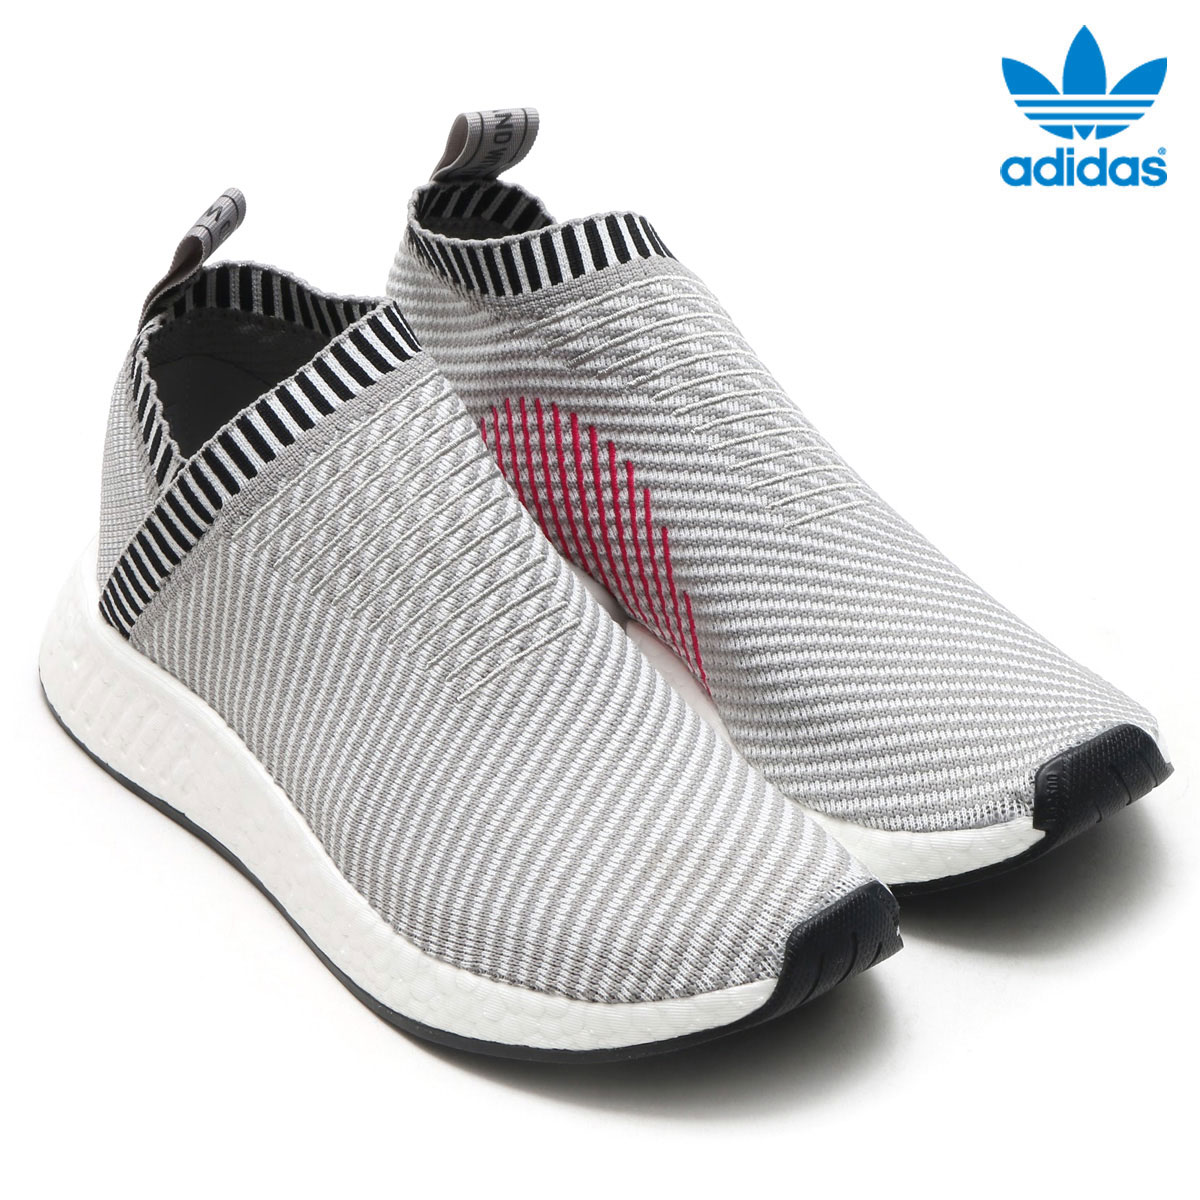 adidas Originals NMD CS2 PK (Adidas originals NMD CS2 PK) (DGH SOLID GREY)